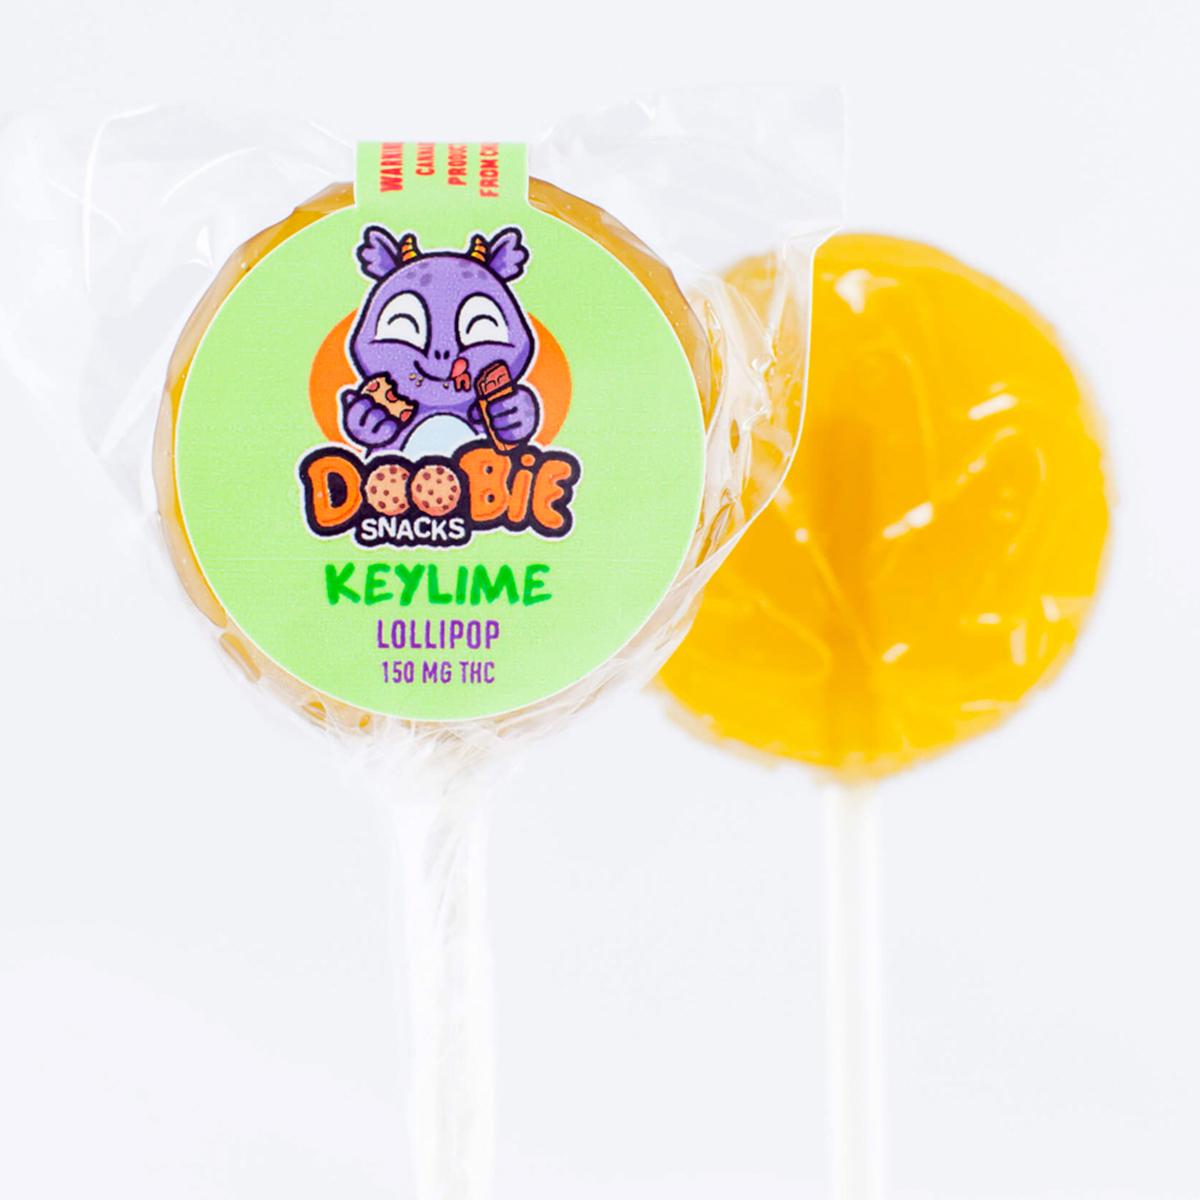 Keylime Lollipops 150MG THC by Doobie Snacks